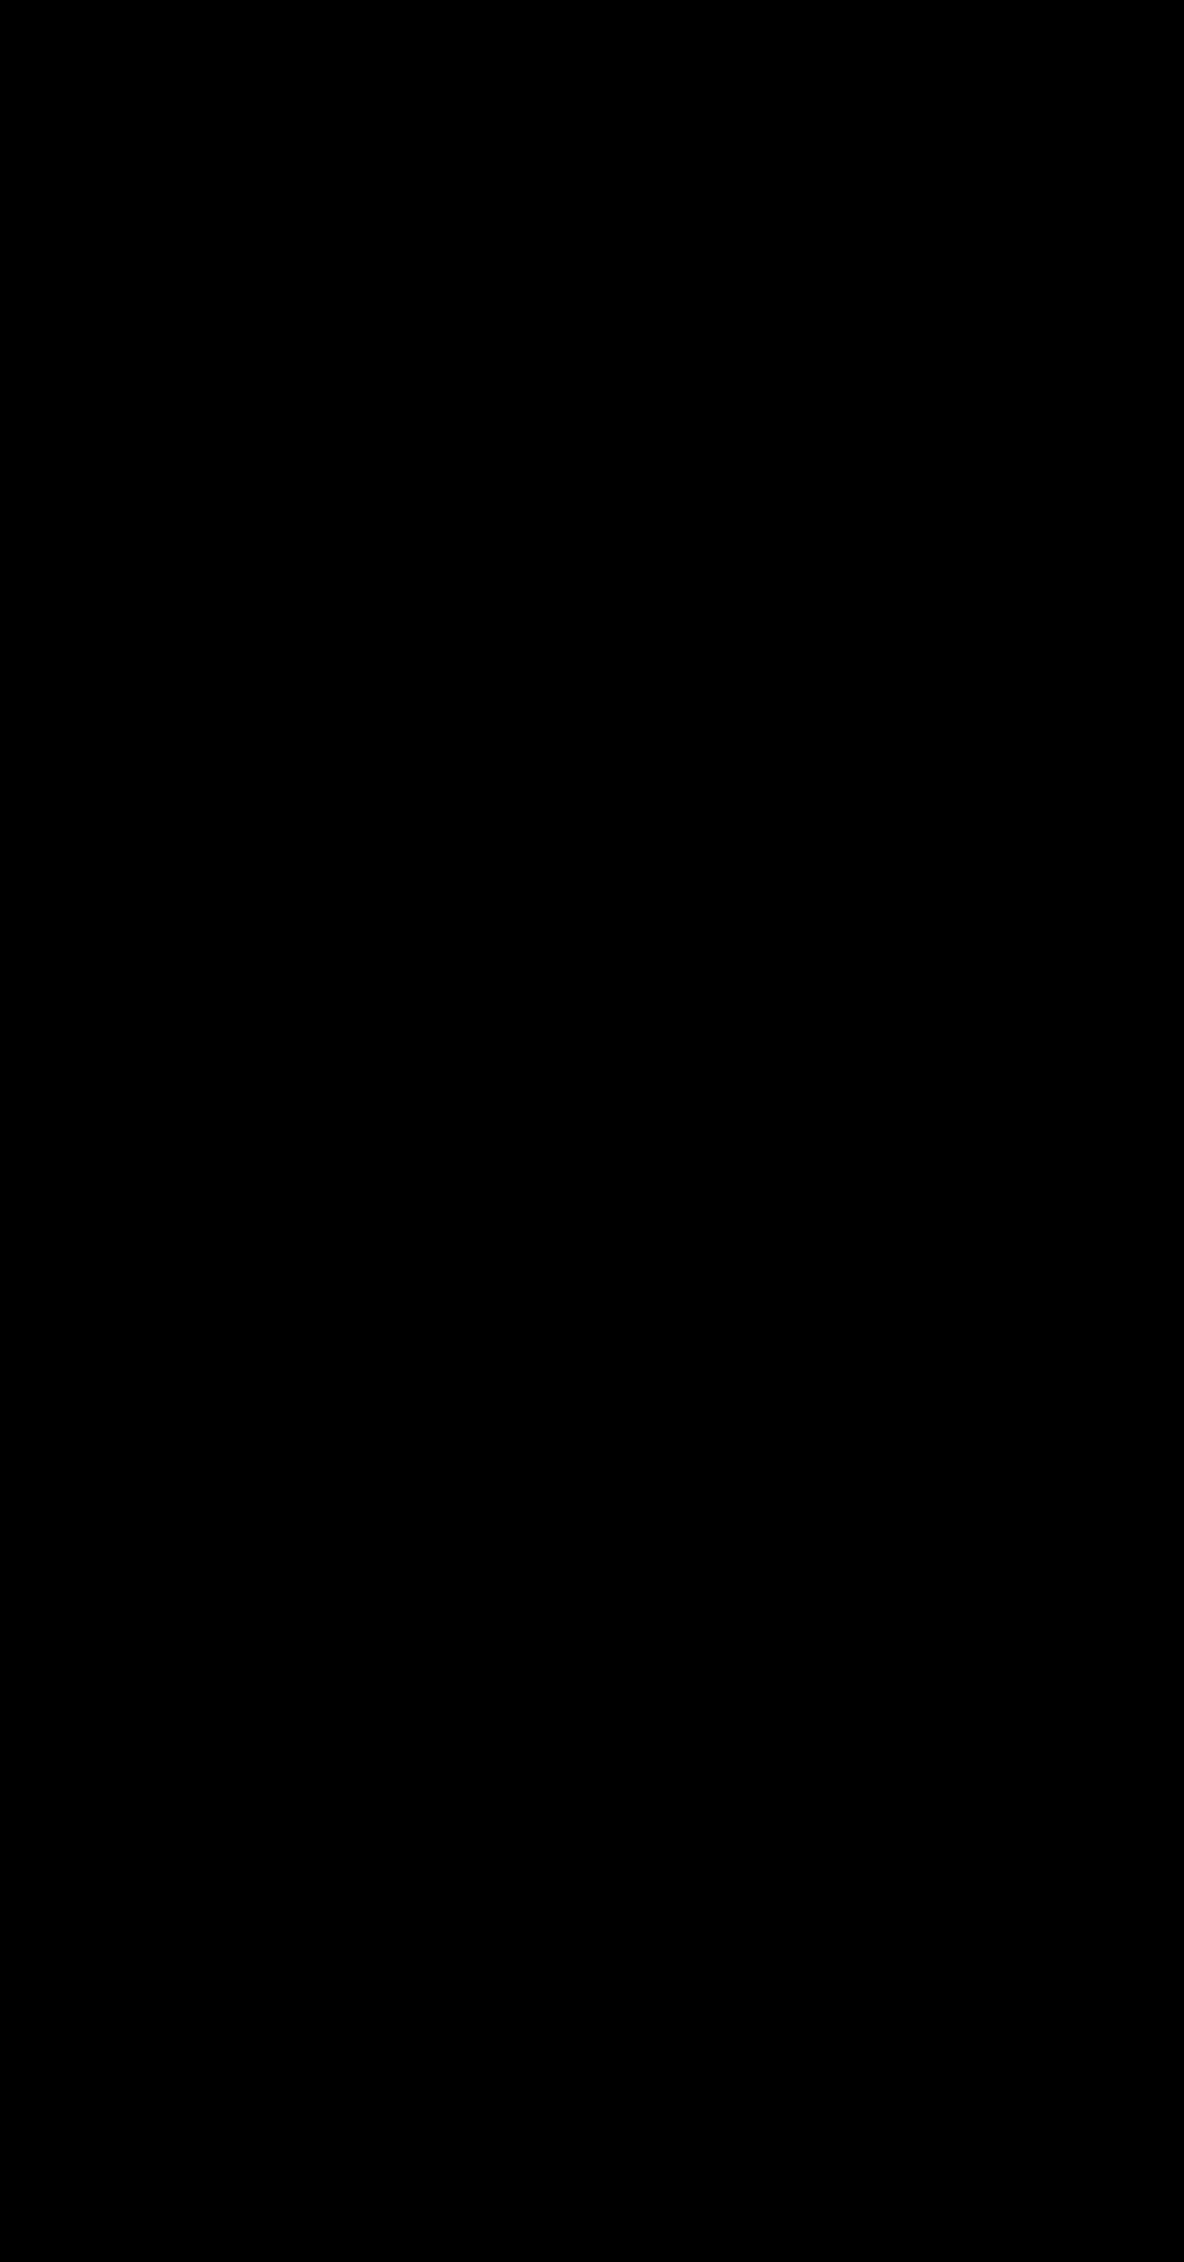 1184x2262 Clipart